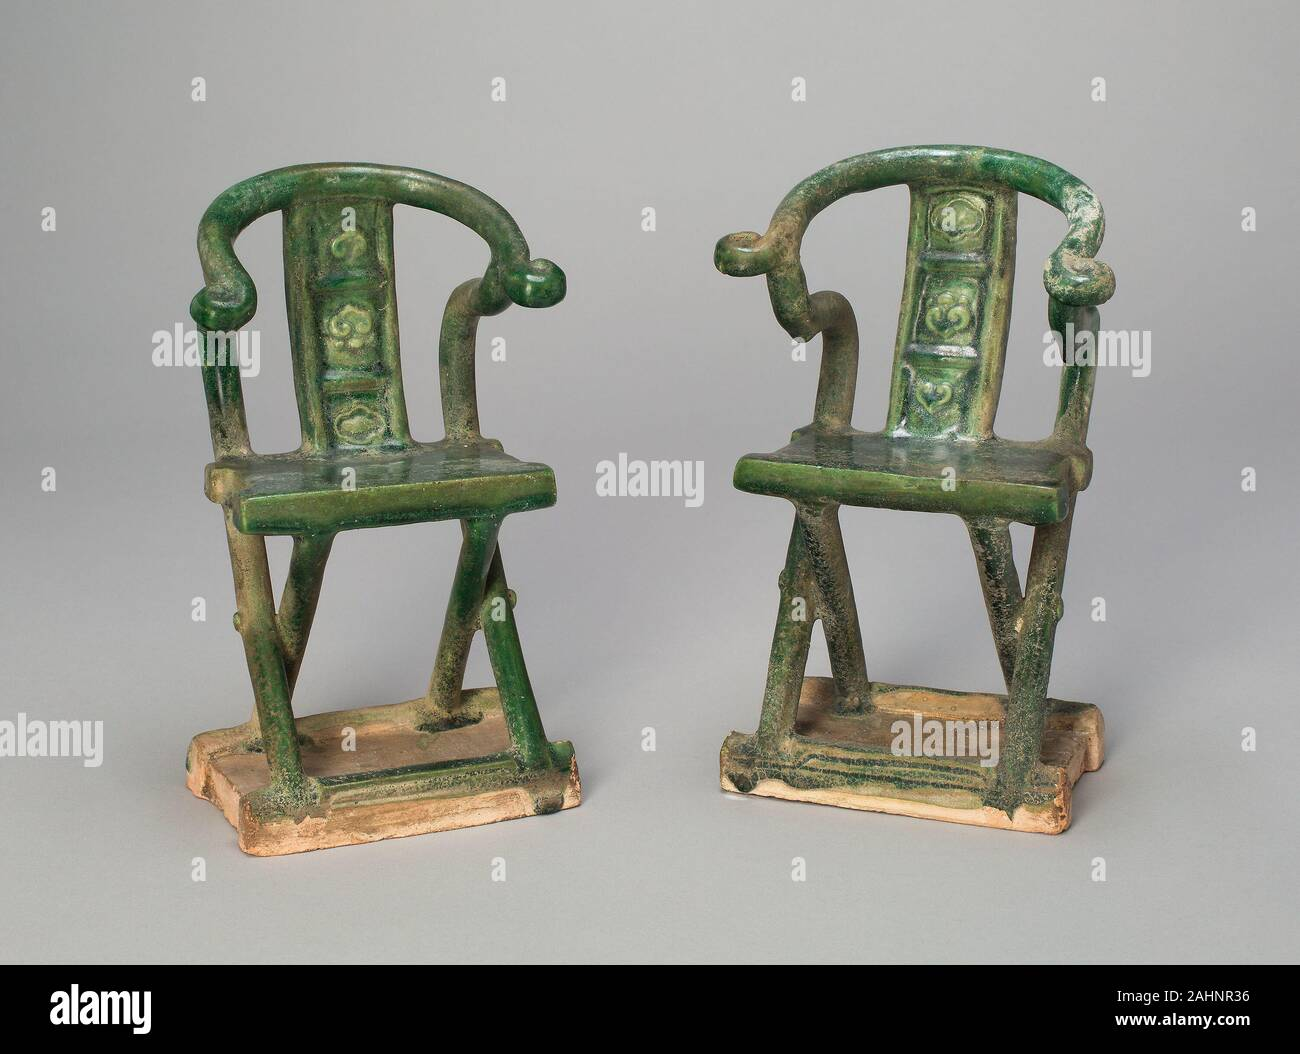 Miniature Folding Chair Mingqi 1368 1644 China Earthenware With Green Glaze And Underglaze Molded Decoration Stock Photo Alamy